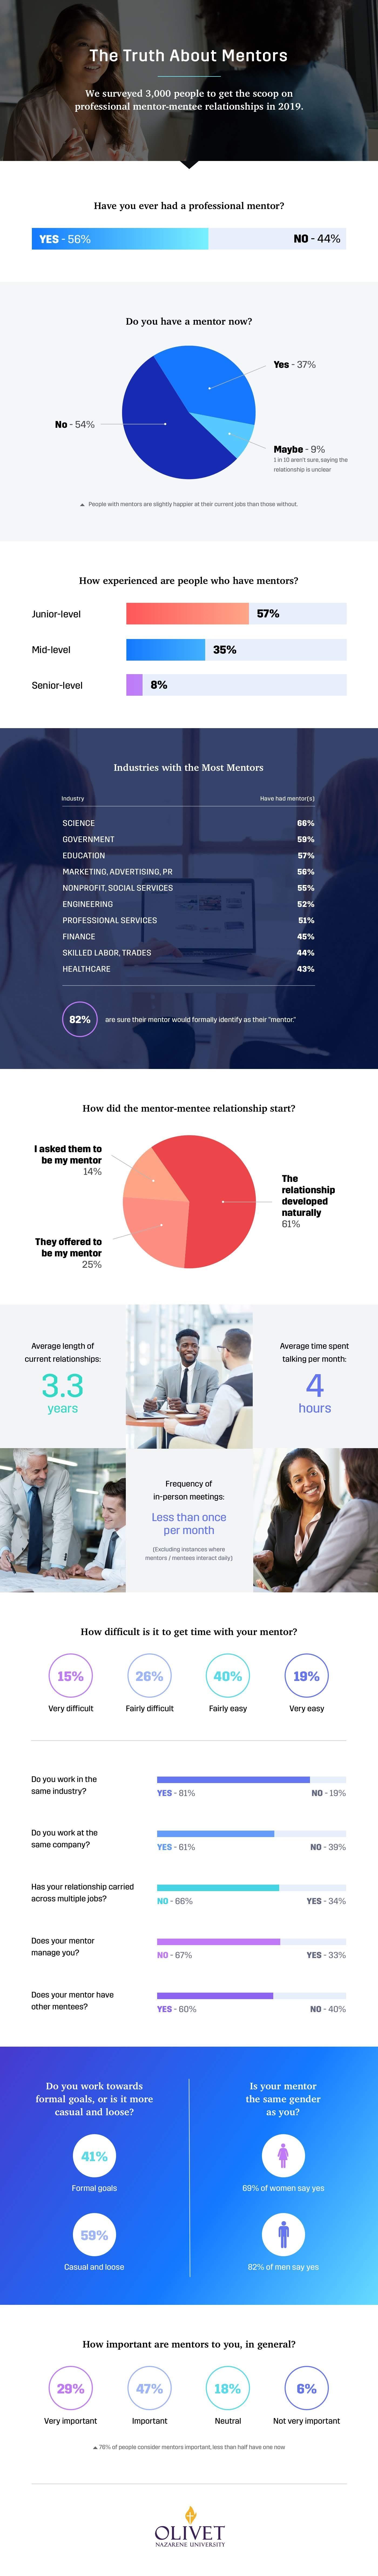 Truth Mentors info